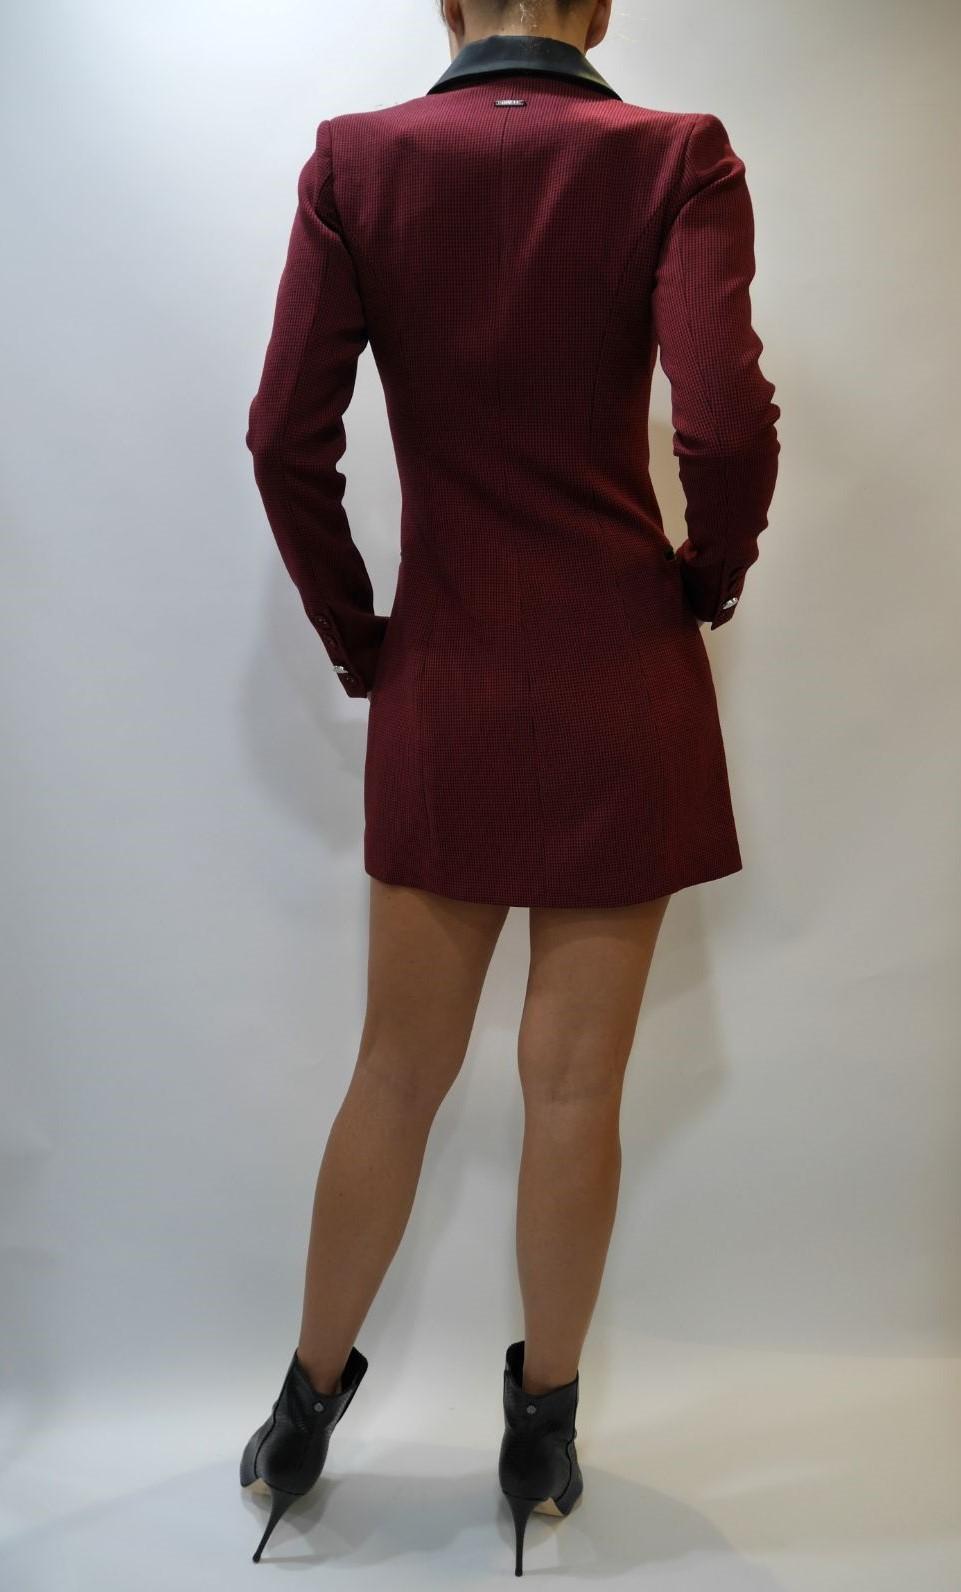 W94K9IWAOH0-FA59 ASHLEY DRESS 5